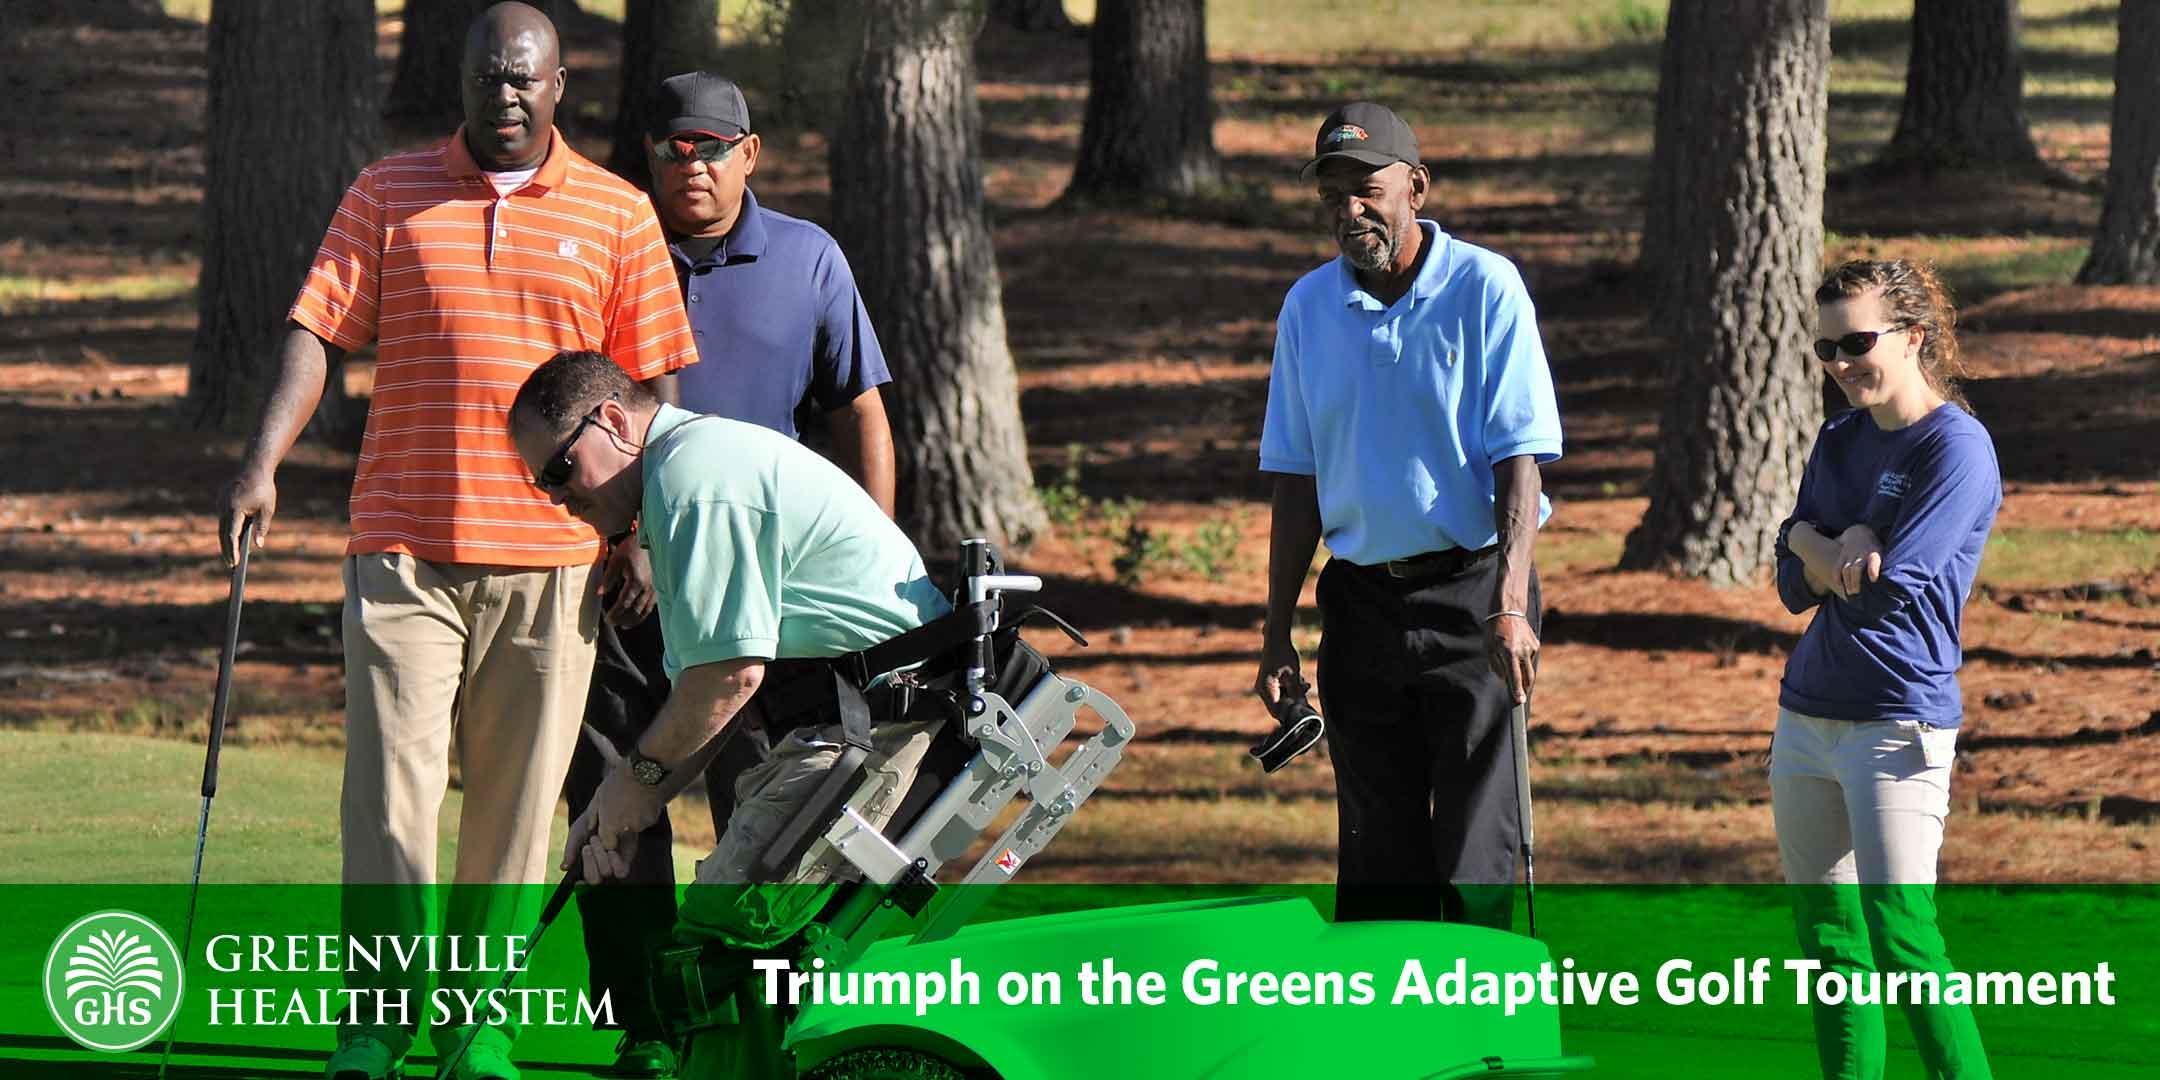 Triumph on the Greens Adaptive Golf Tournament